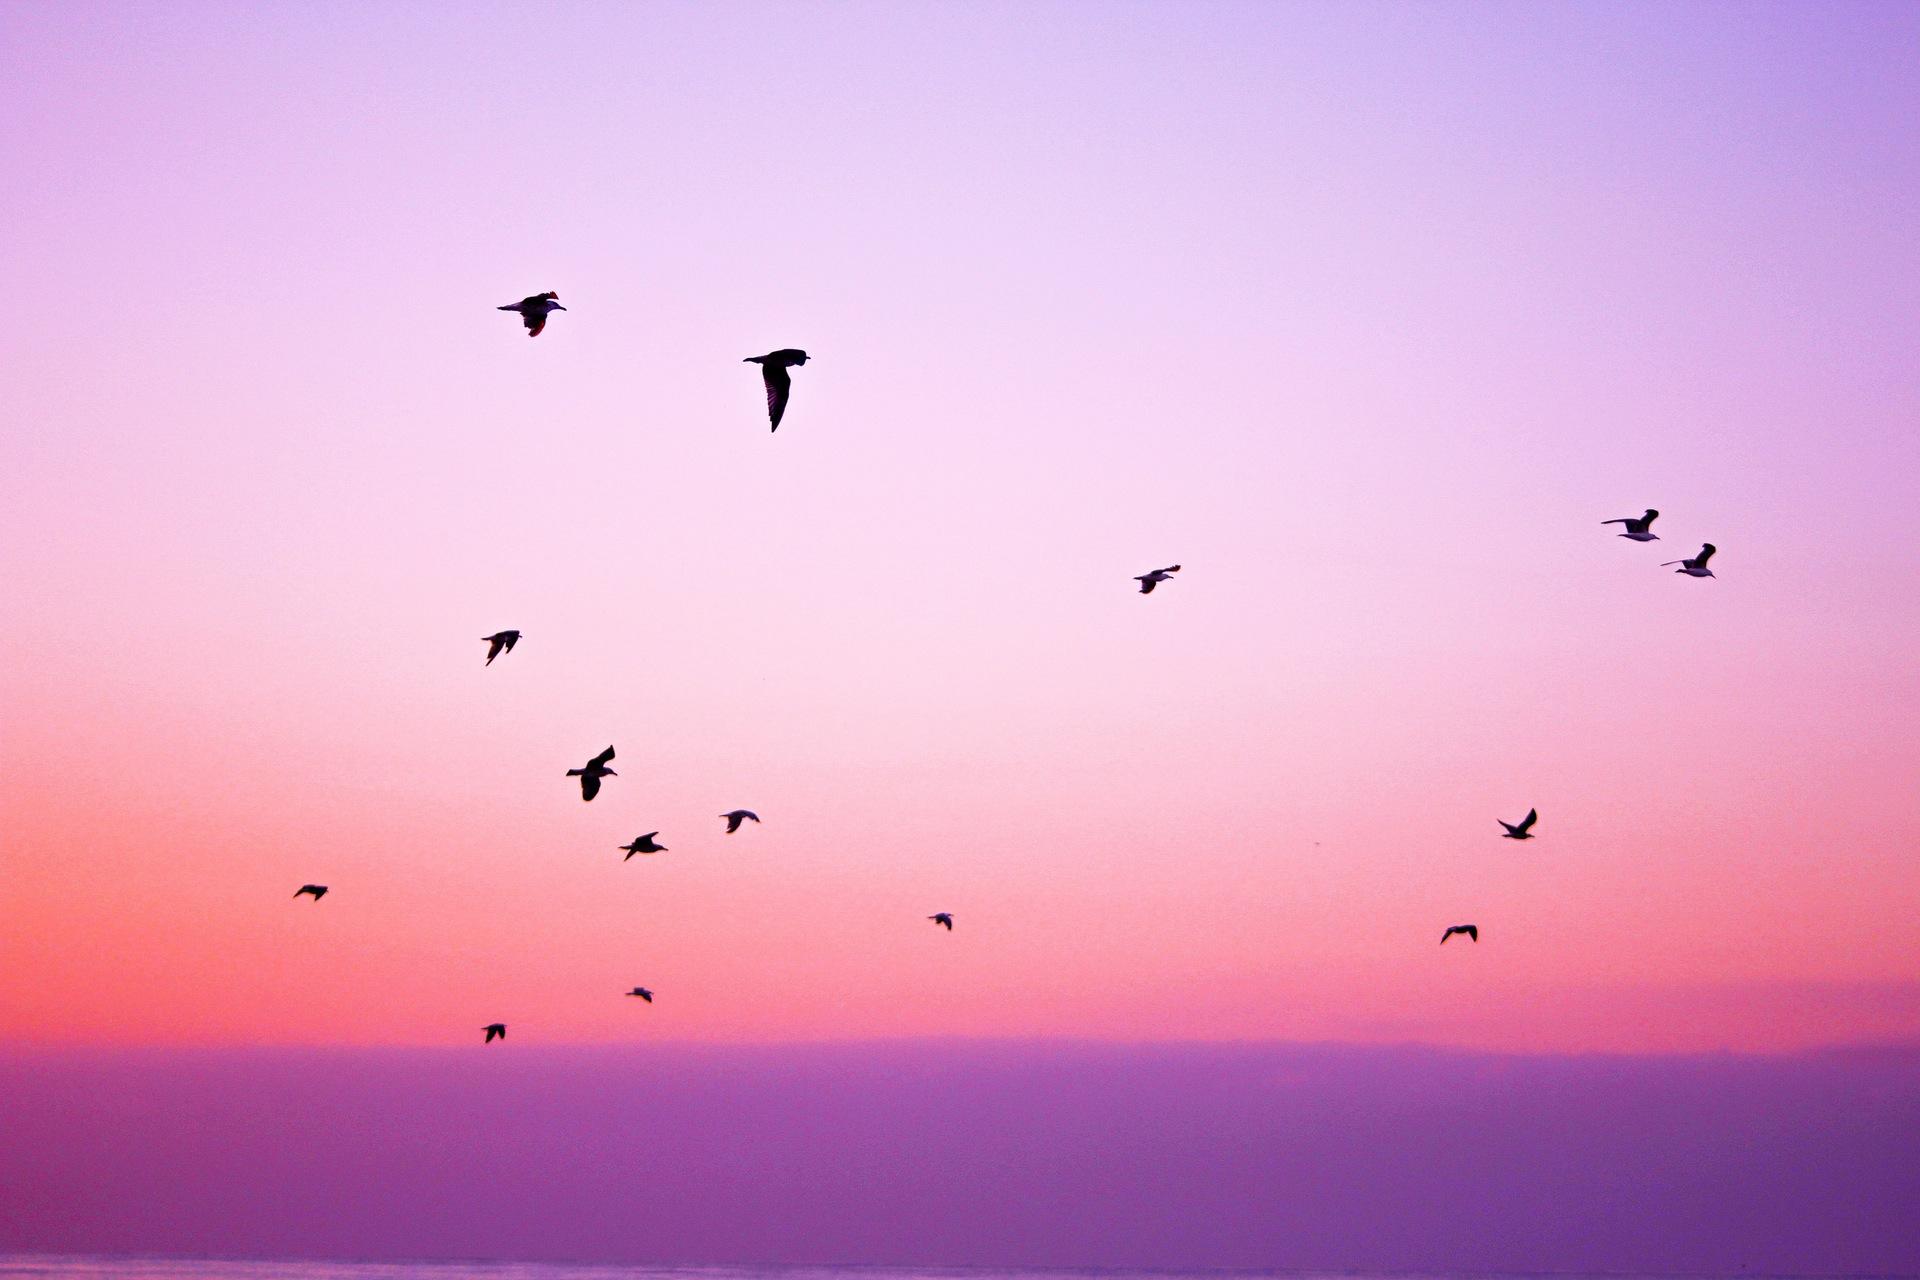 oiseaux, Sky, liberté, Rosa, Purple - Fonds d'écran HD - Professor-falken.com